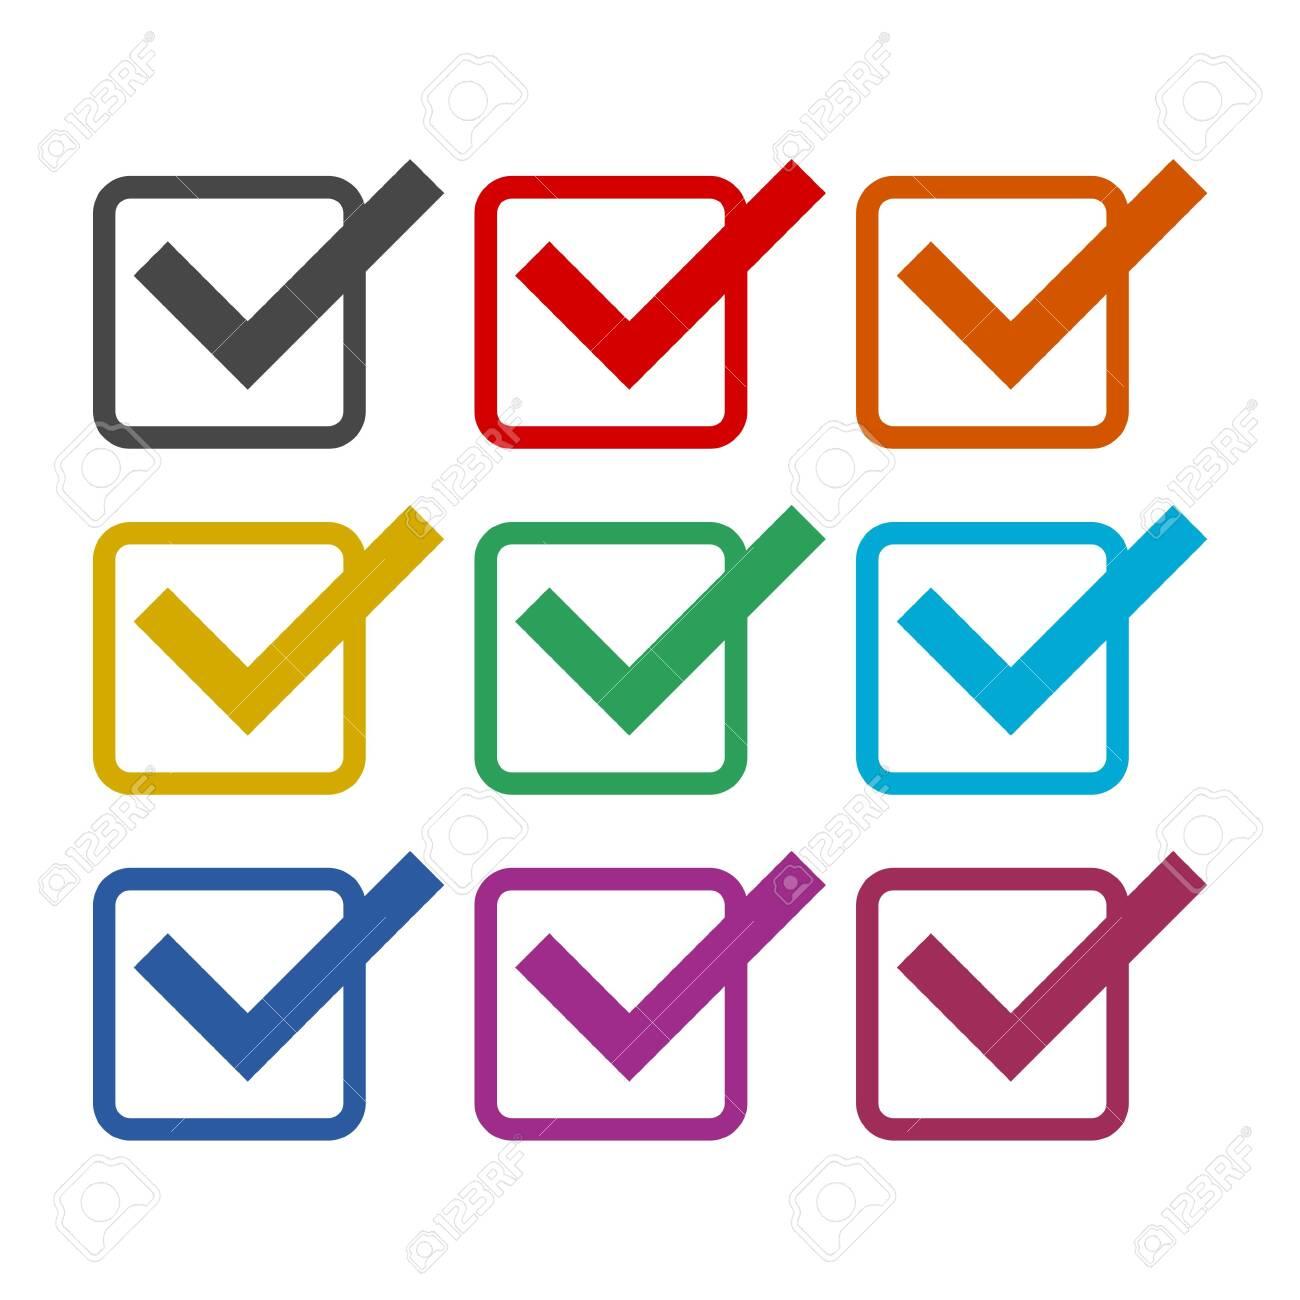 Checklist icon, color icons set - 128863447